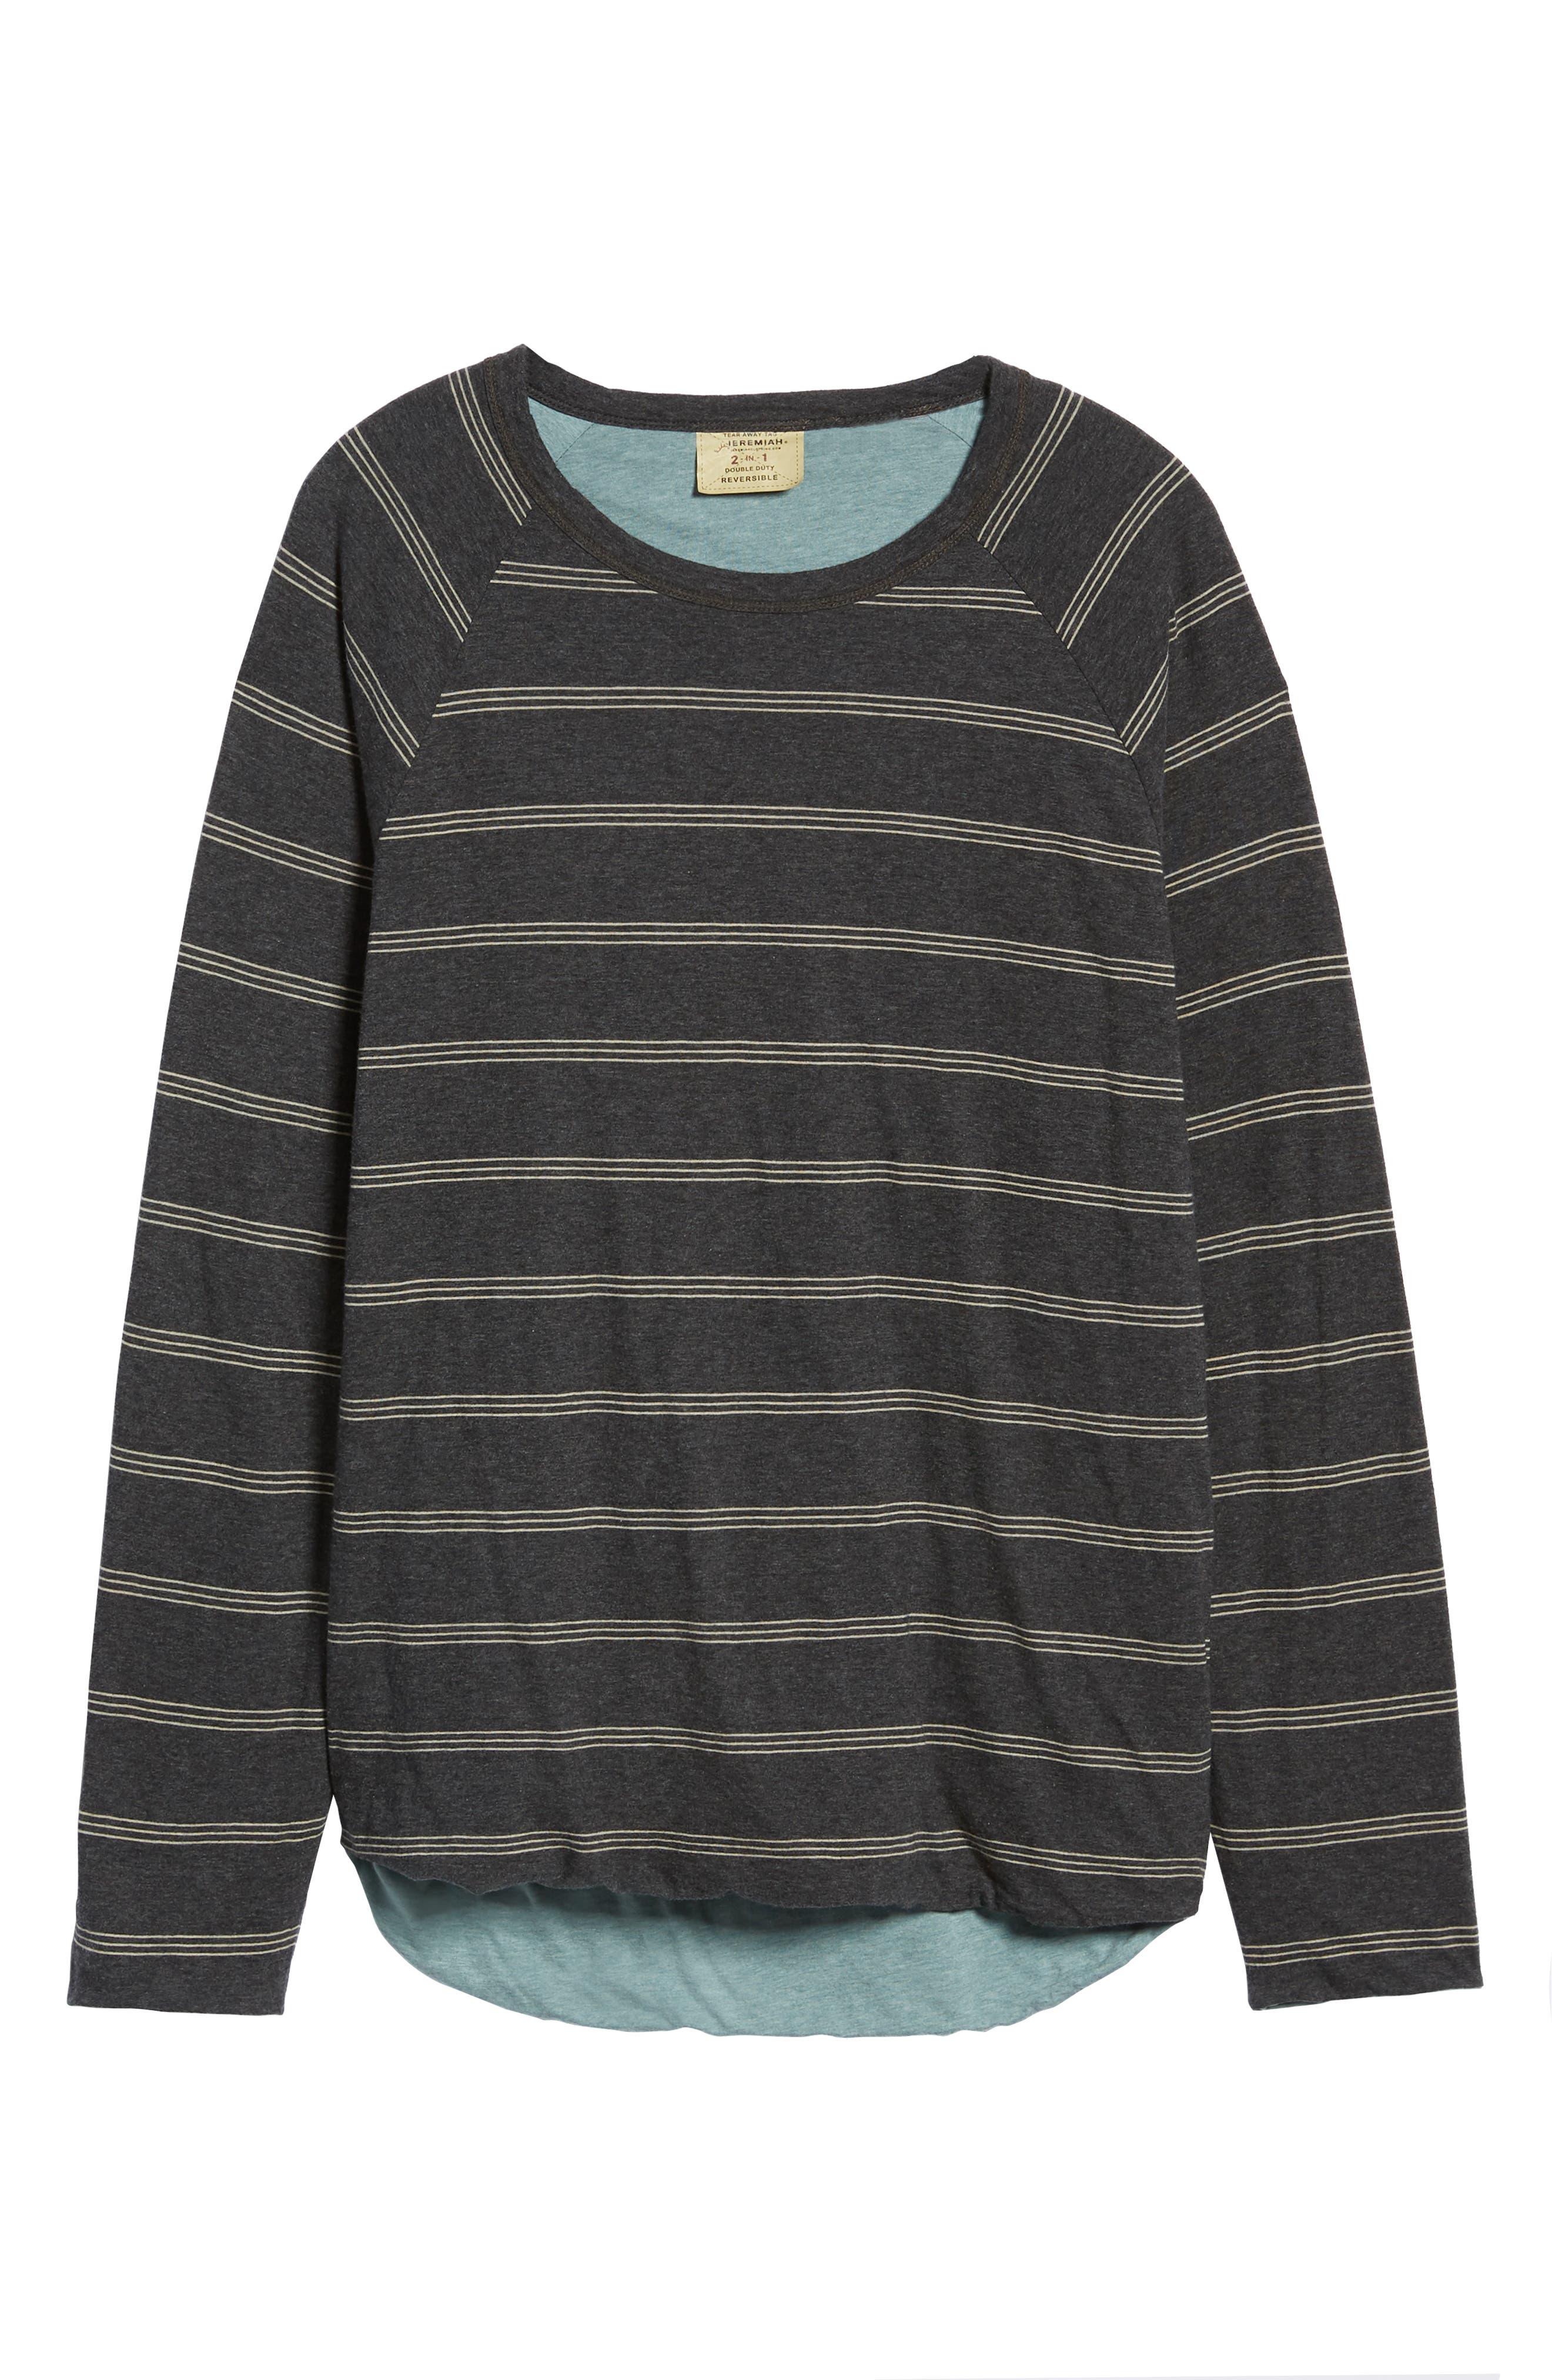 Gunnison Reversible Raglan Sleeve T-Shirt,                             Alternate thumbnail 7, color,                             PHANTOM HEATHER